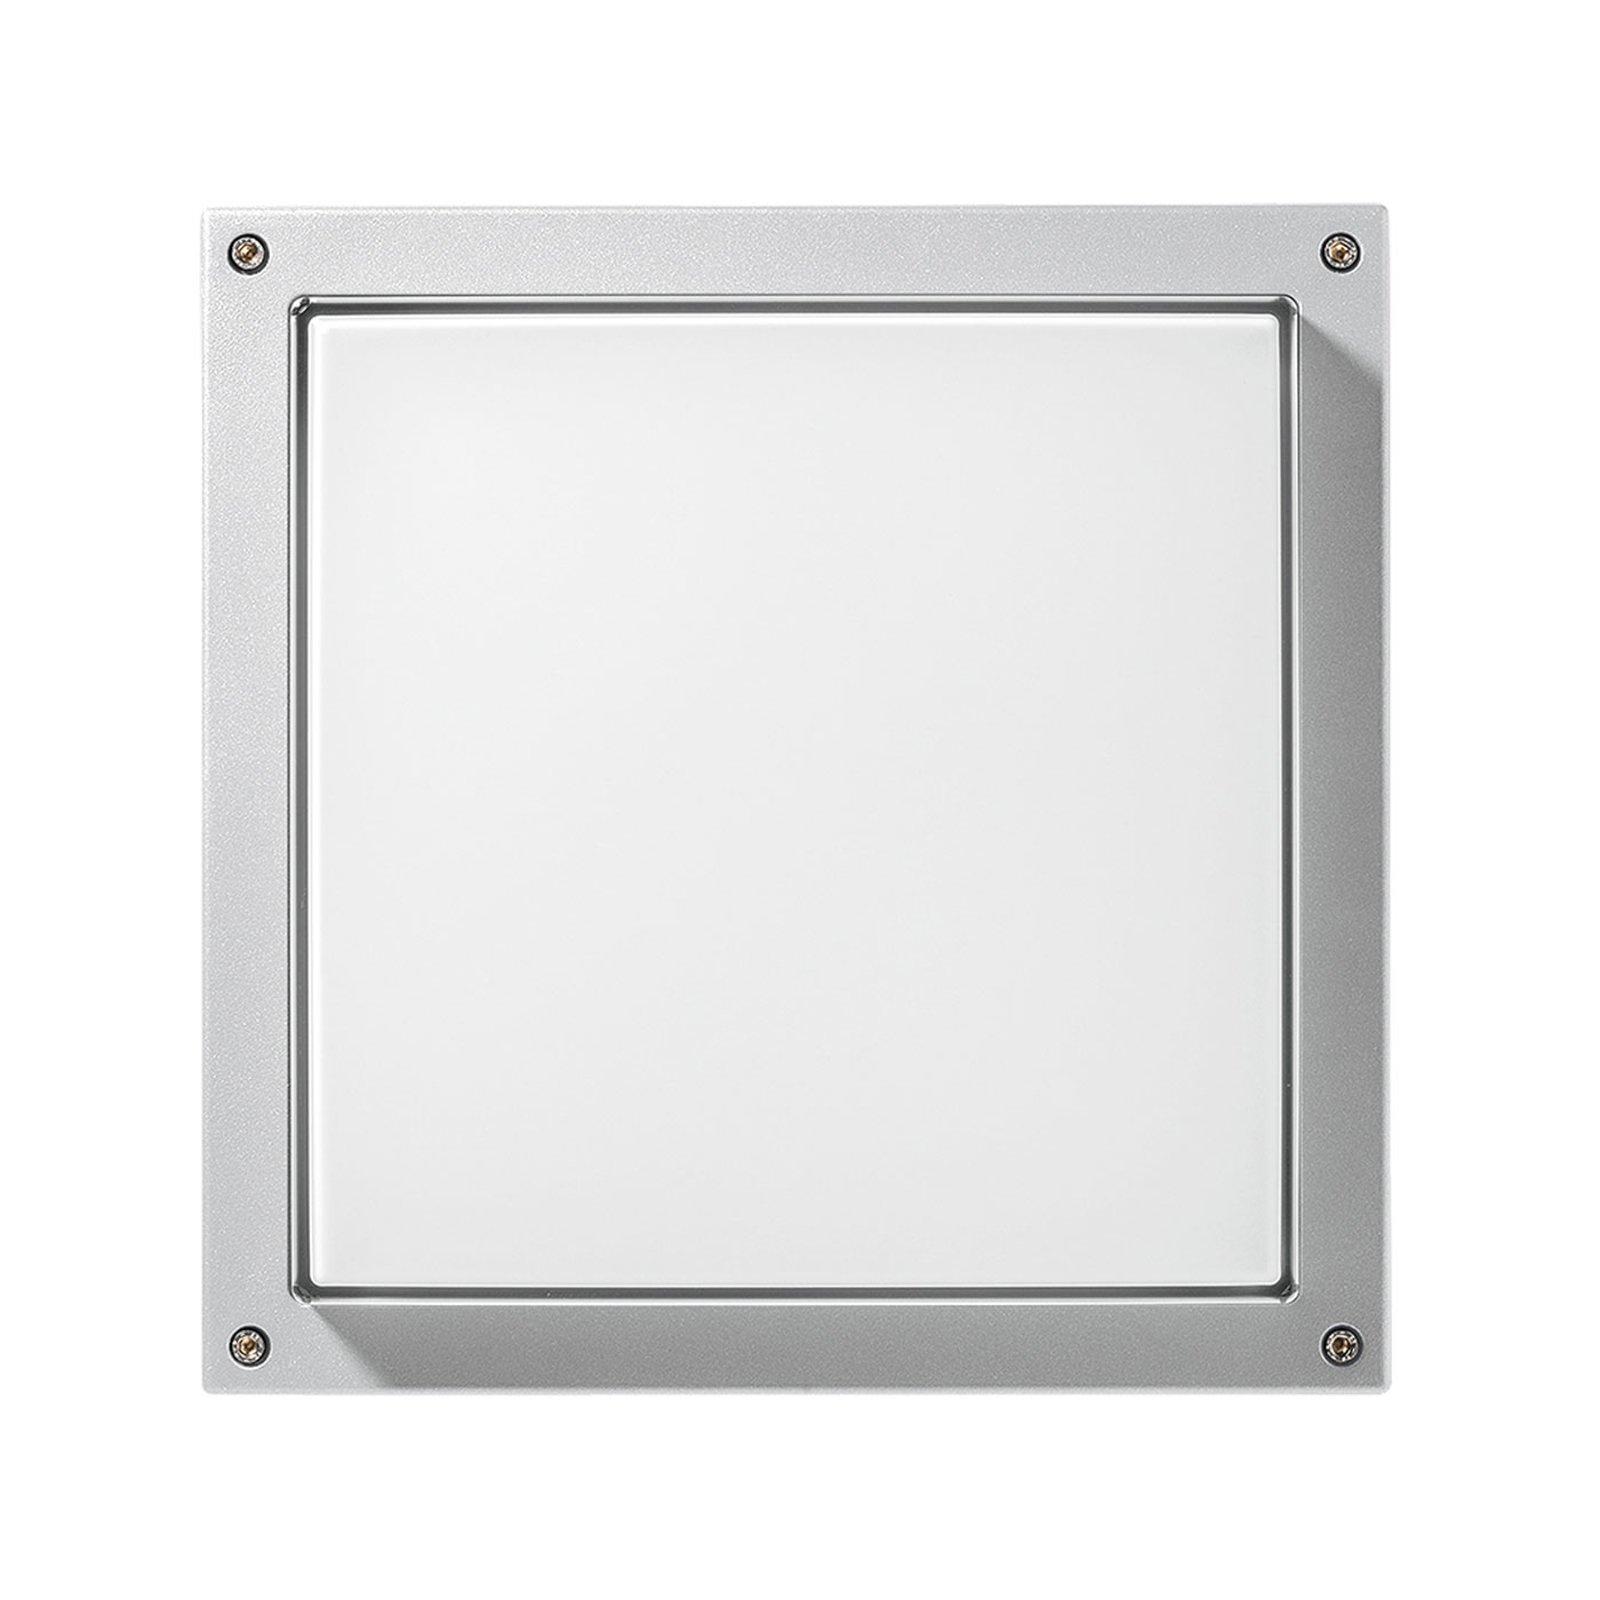 LED-vegglampe Bliz Square 40, 3 000 K, hvit